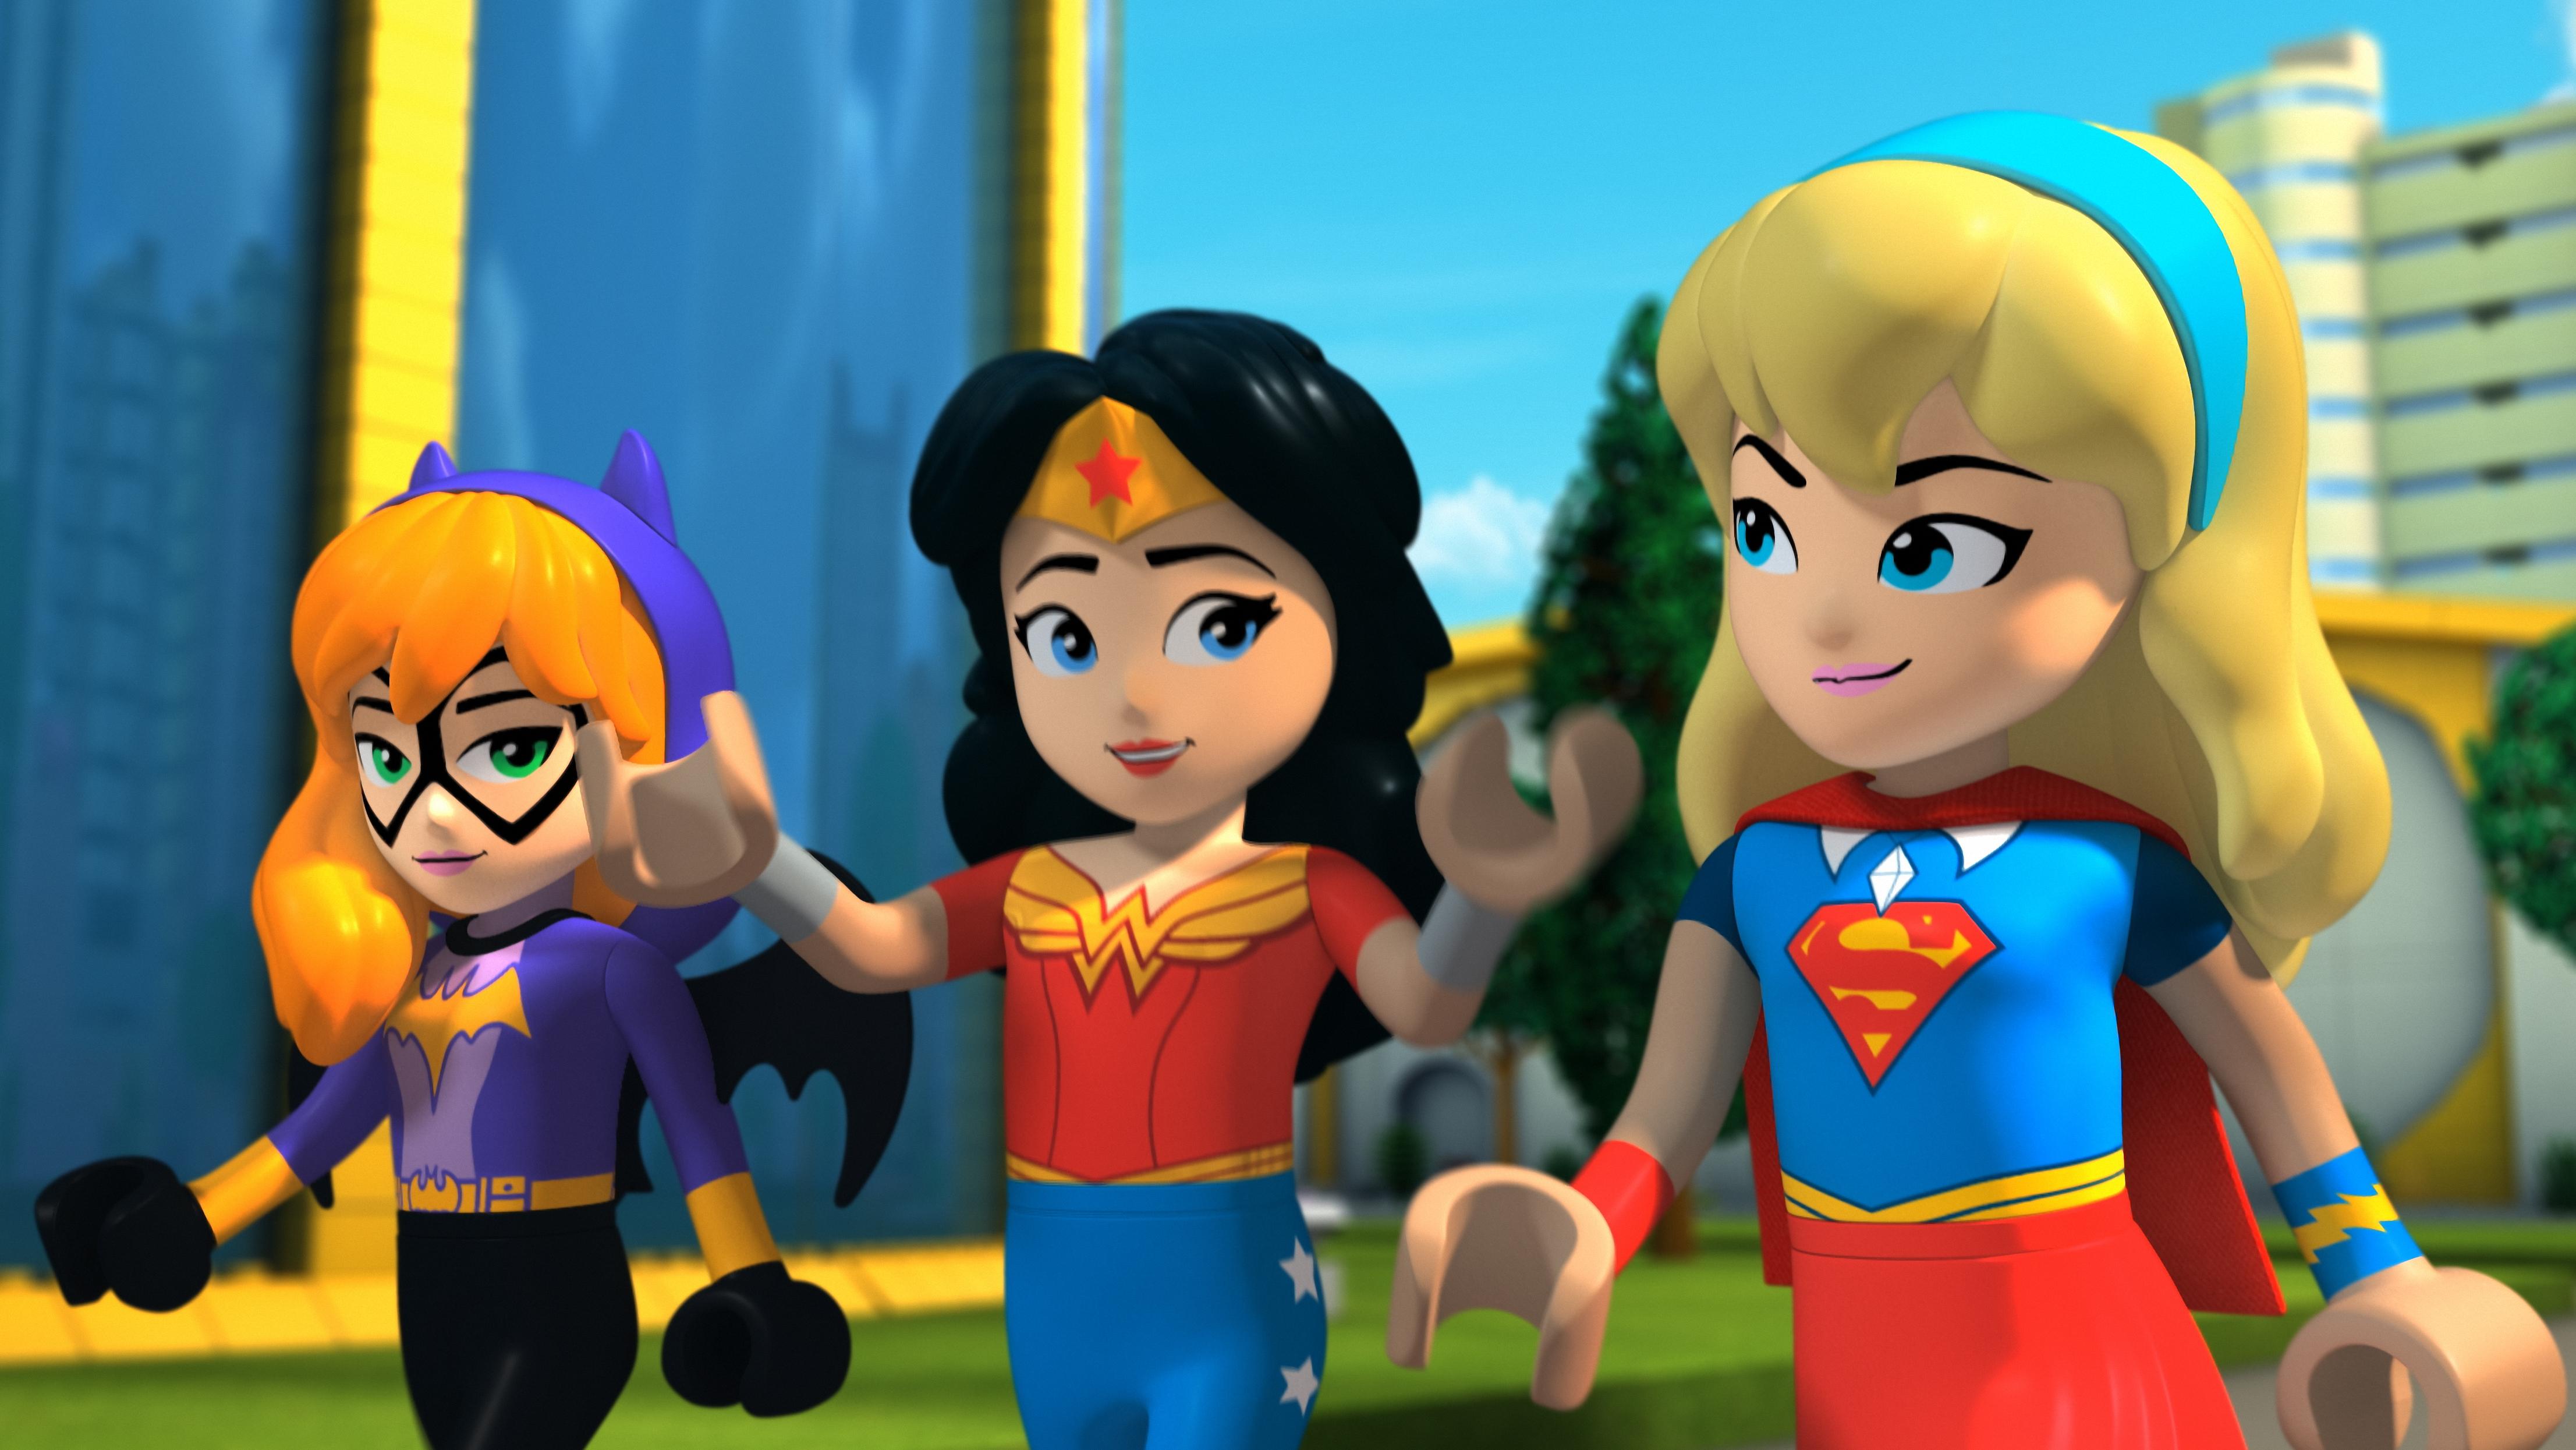 Lego DC Super Hero Girls Wallpaper Full HD